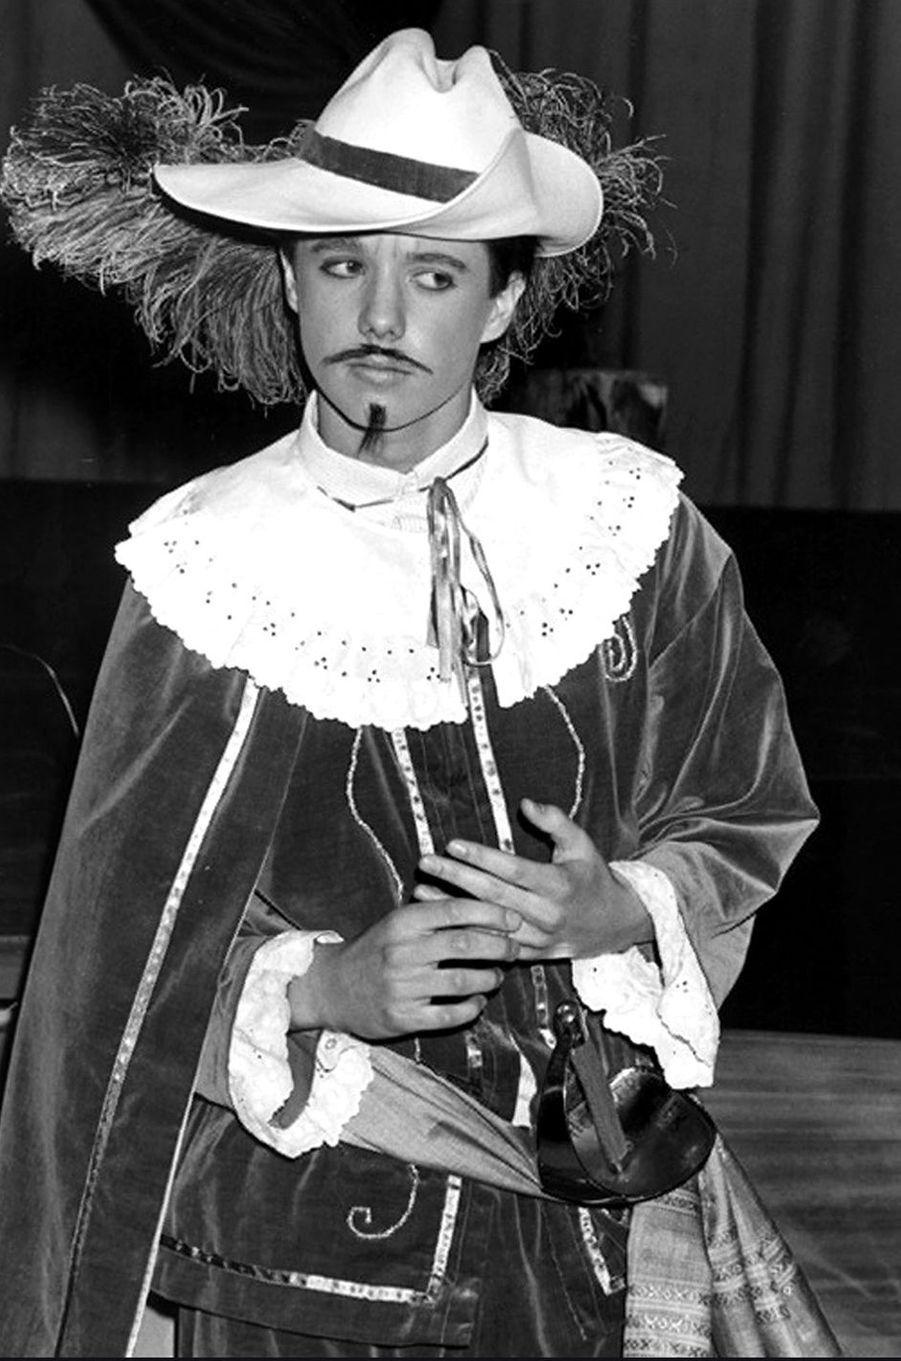 Le prince Frederik de Danemark le 11 novembre 1984